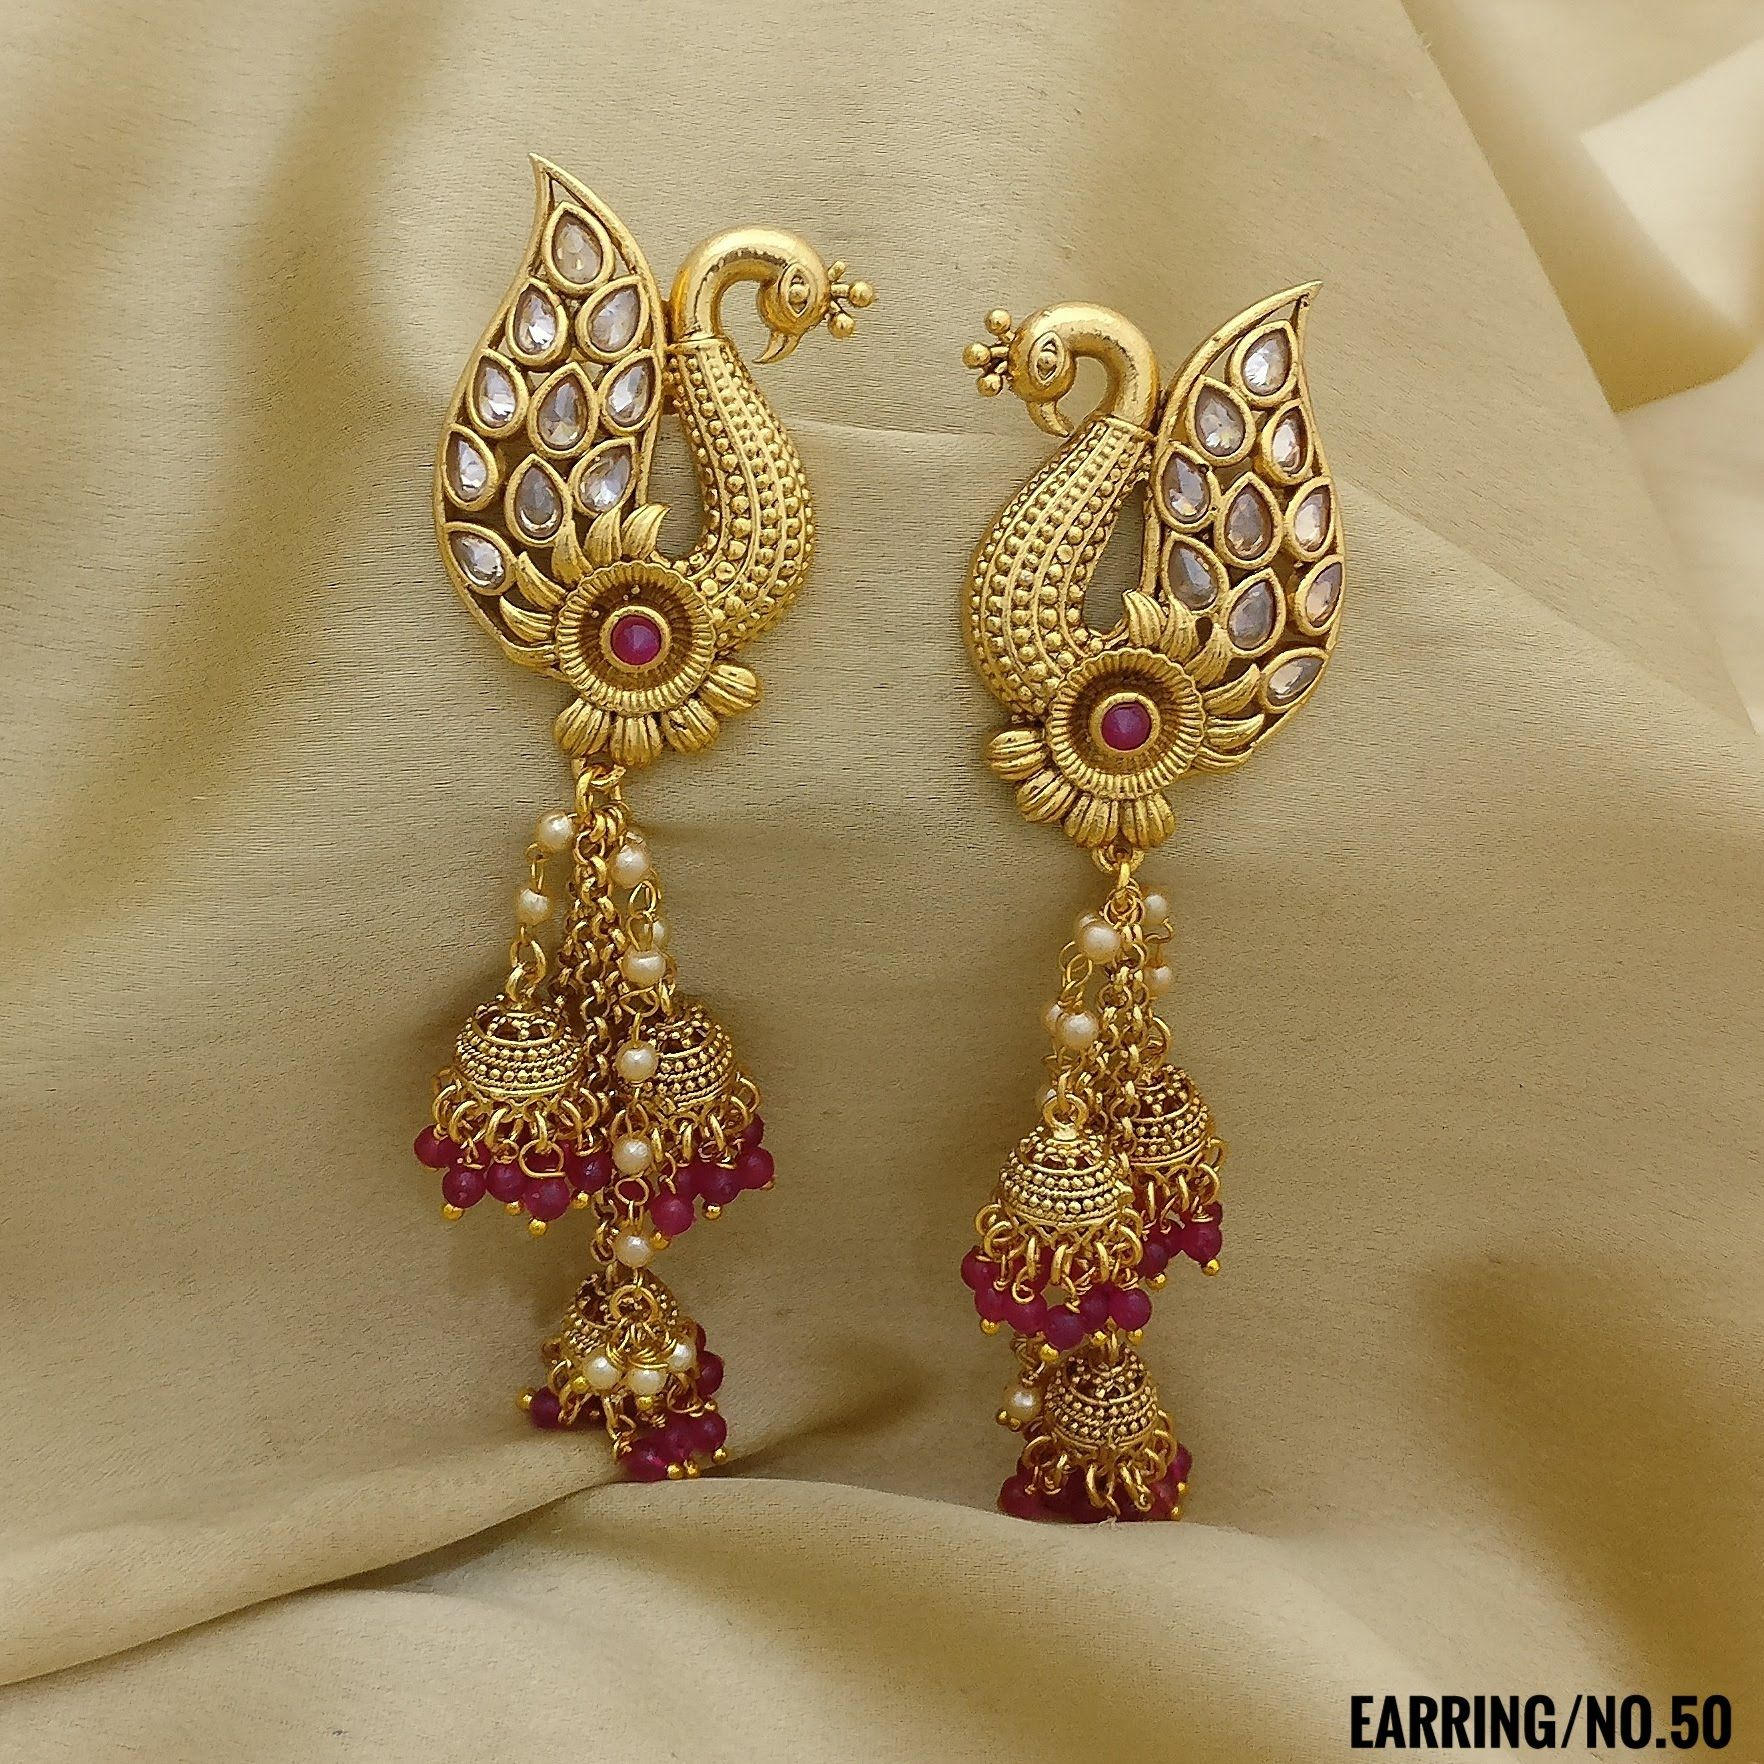 Rasrava Antique Polki Earrings Peacock With Jhumki Style Earrings